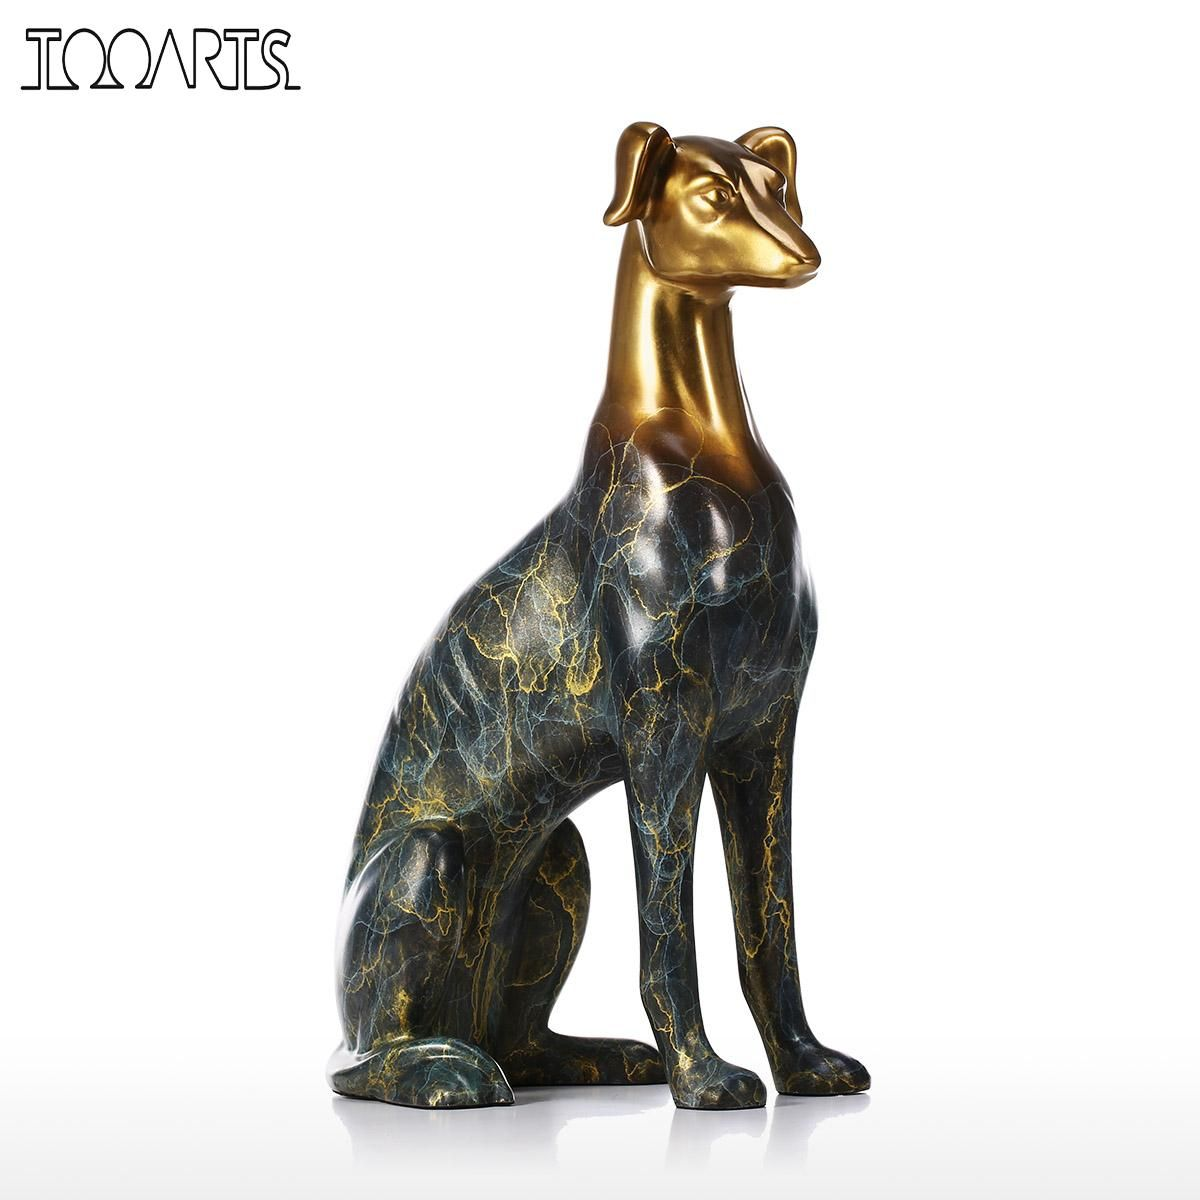 Tooarts Labrador Dog Bronze Sculpture Home Decor Sculpture Desktop Decorative Figurine Handmade Animal Statues & Sculptures